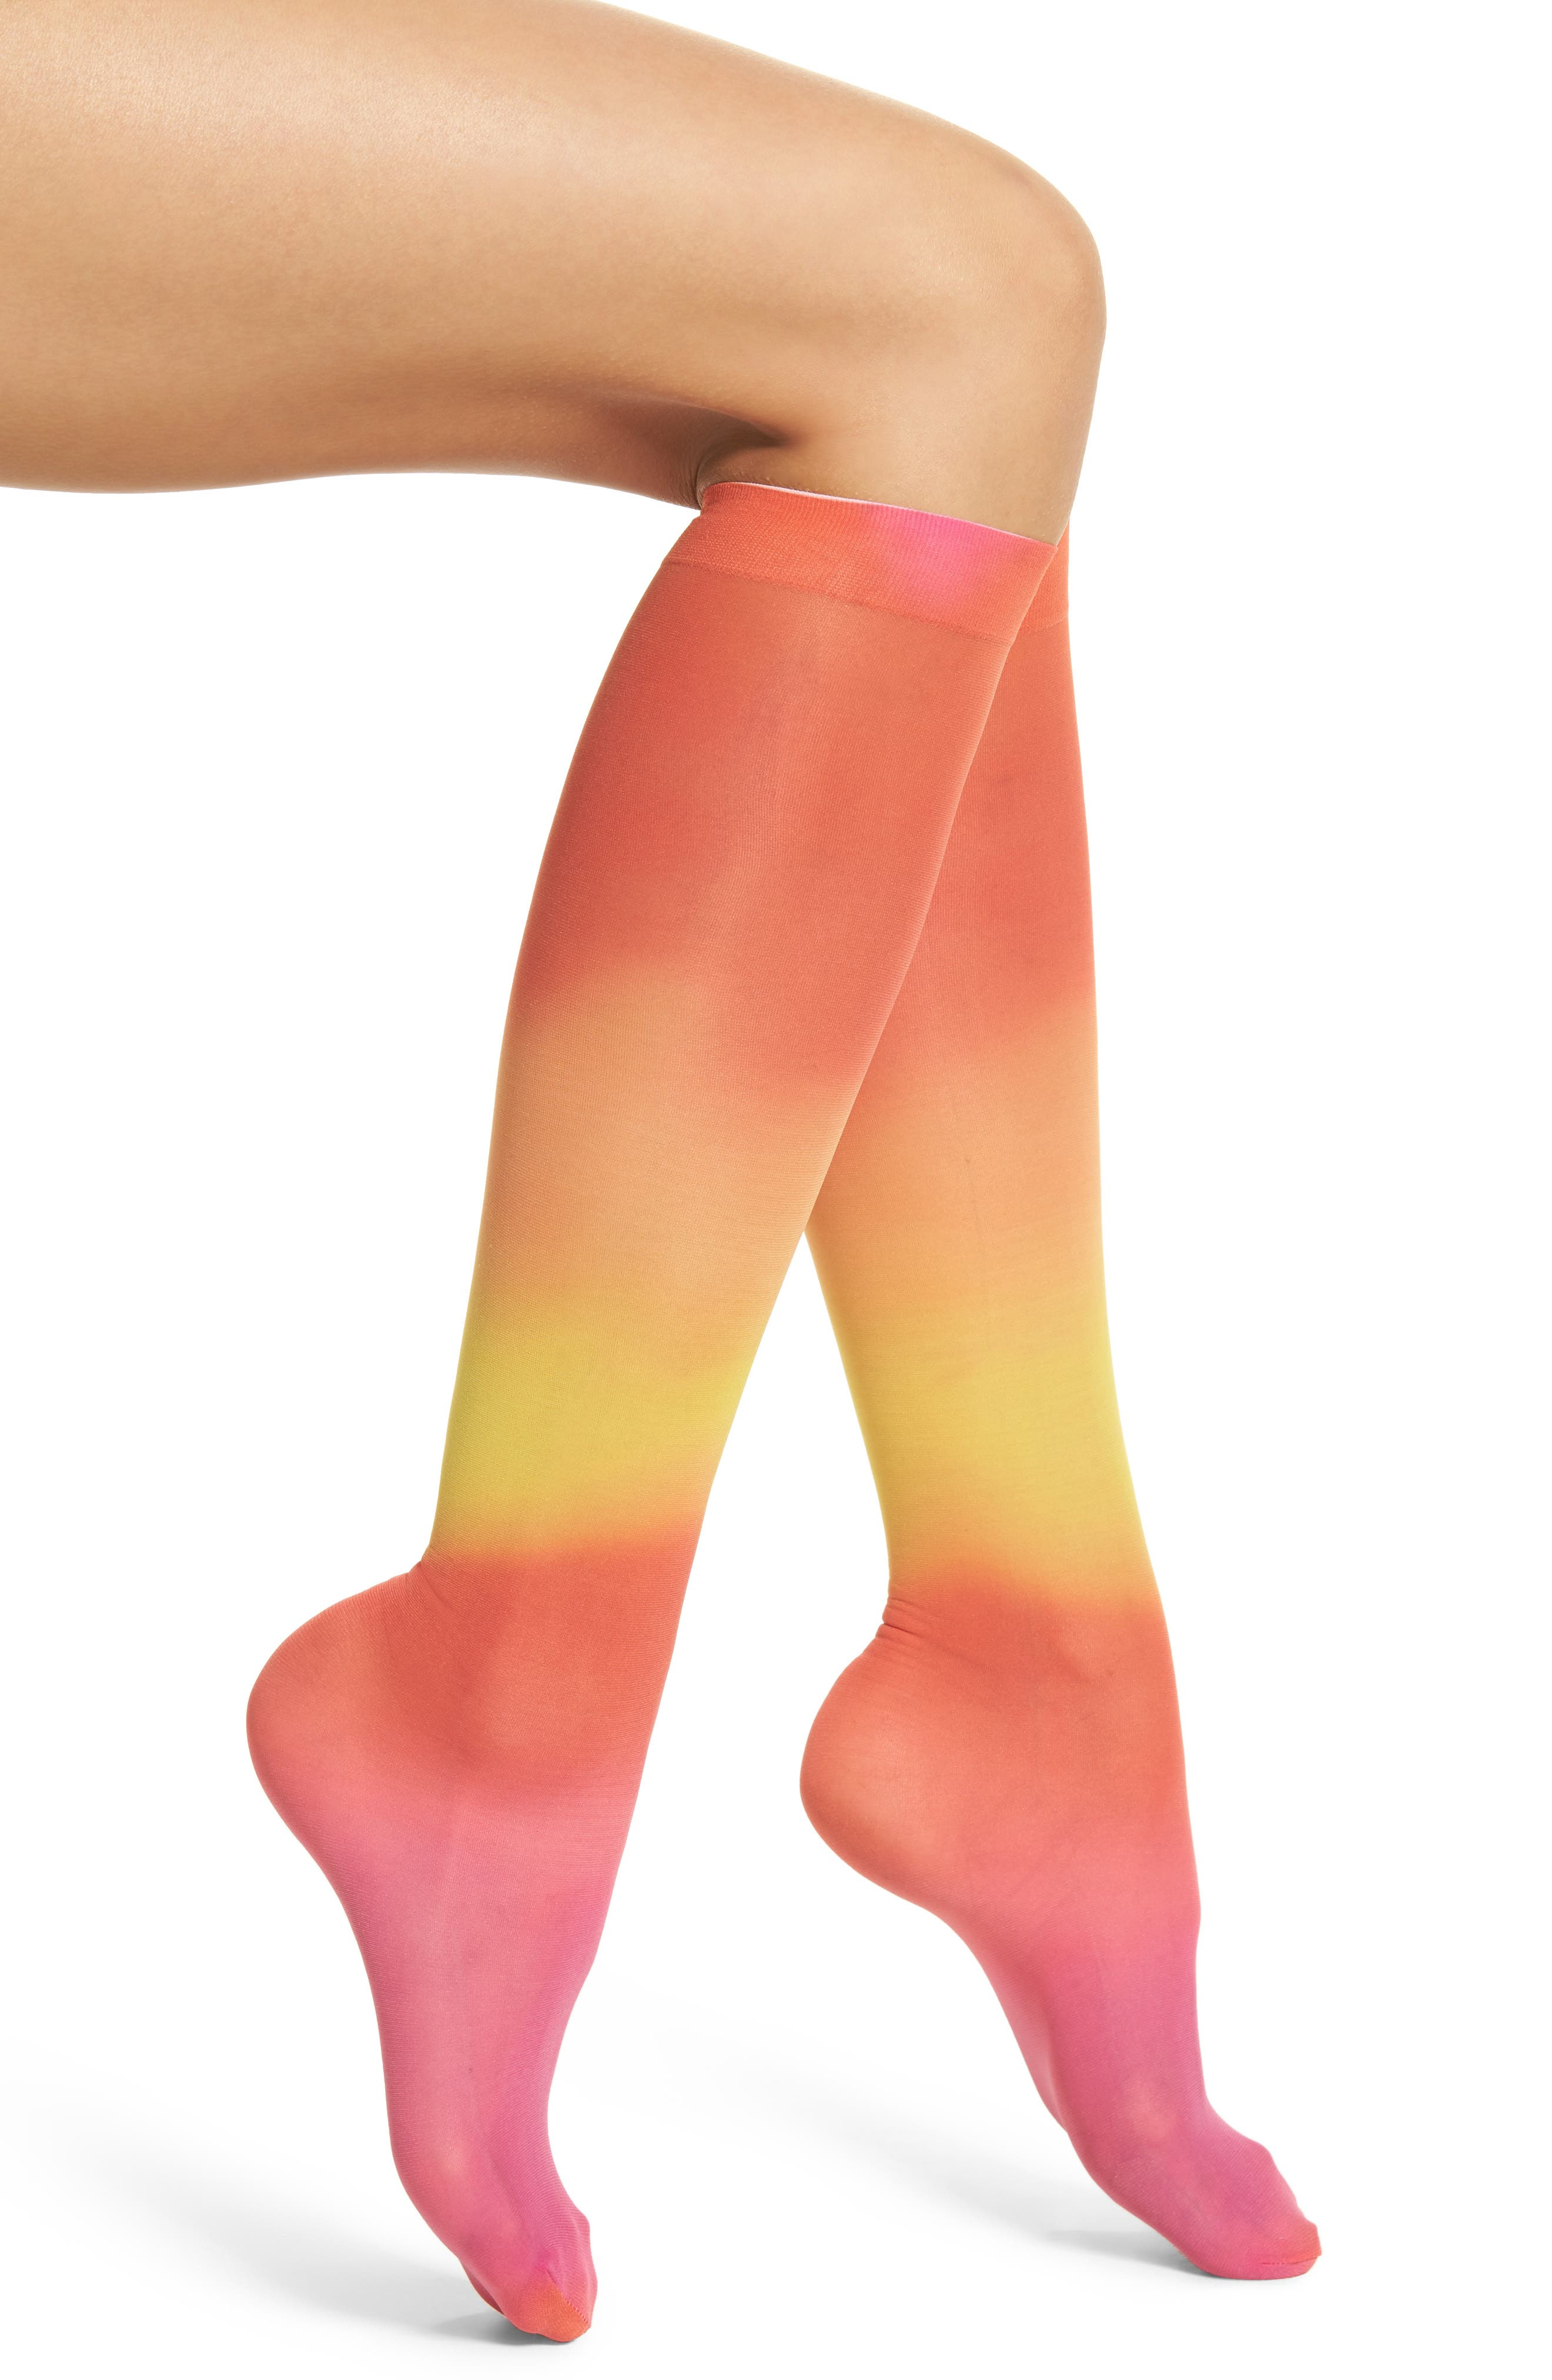 Mia Print Knee High Socks,                         Main,                         color, 700